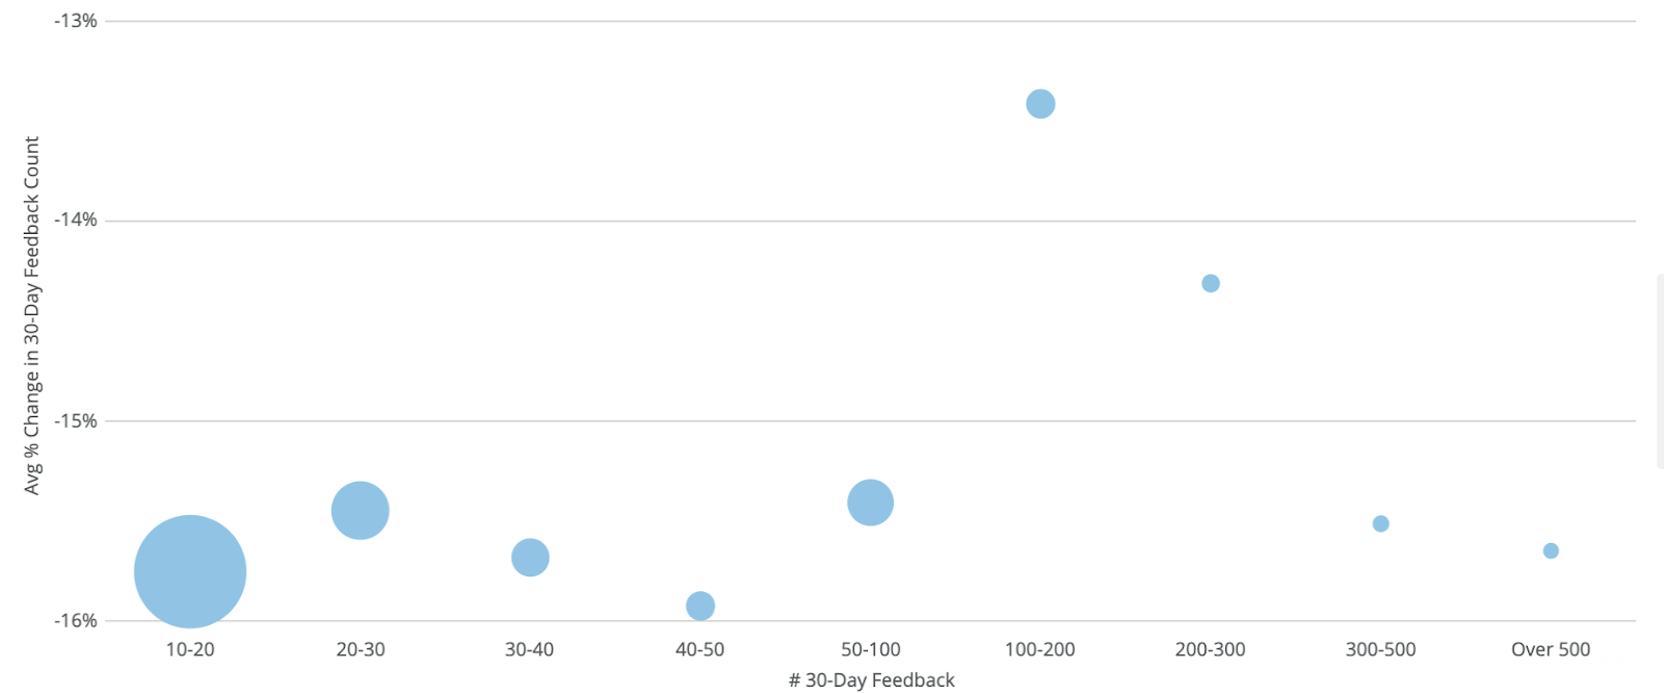 chart showing amazon 30-day feedback trends during covid-19 coronavirus